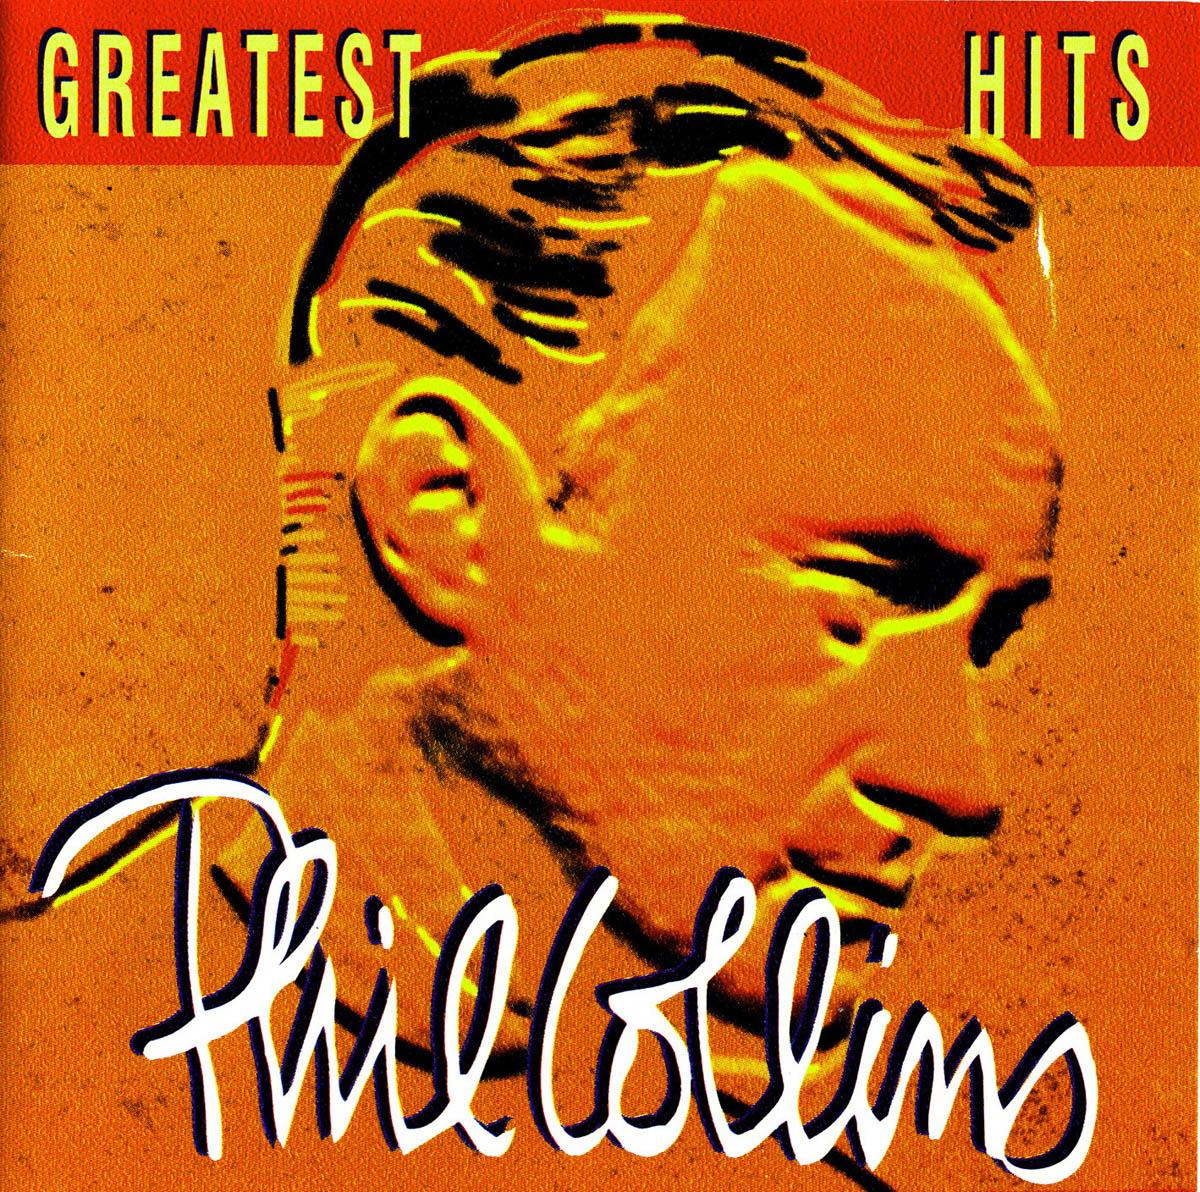 Pop Rock Phil Collins Greatest Hits 1994 Best Ballads 1998 2cd Ape Flac